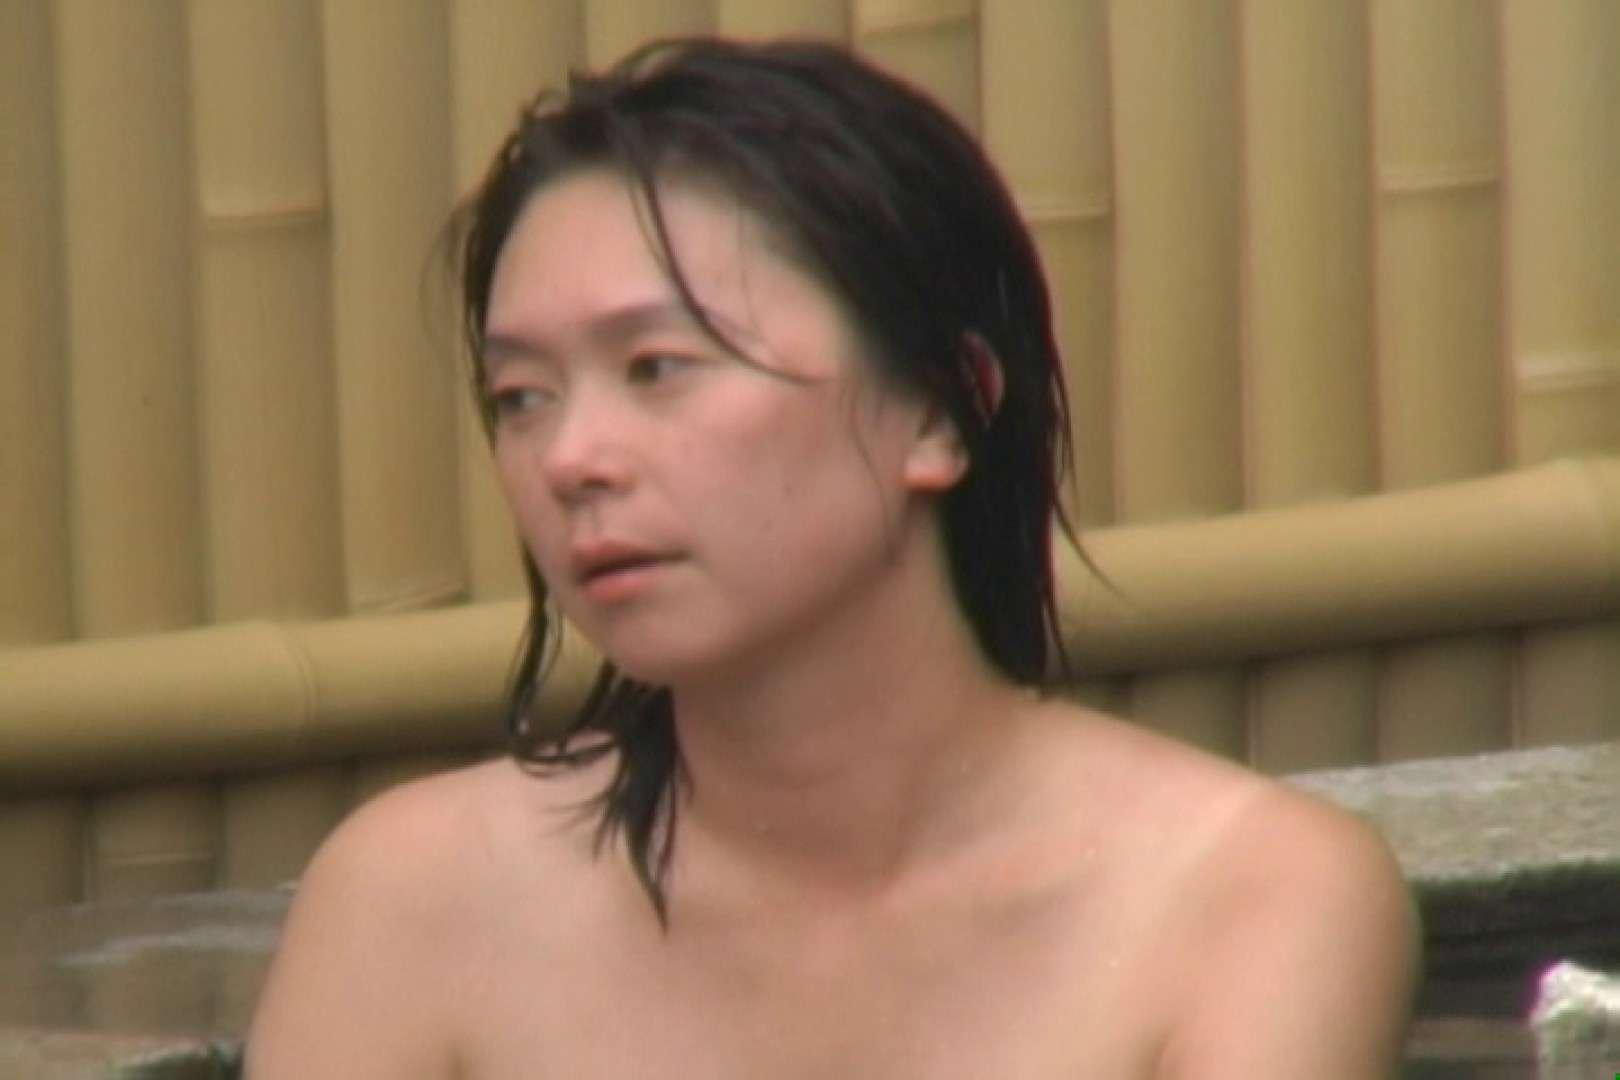 Aquaな露天風呂Vol.619 HなOL オマンコ動画キャプチャ 107pic 62